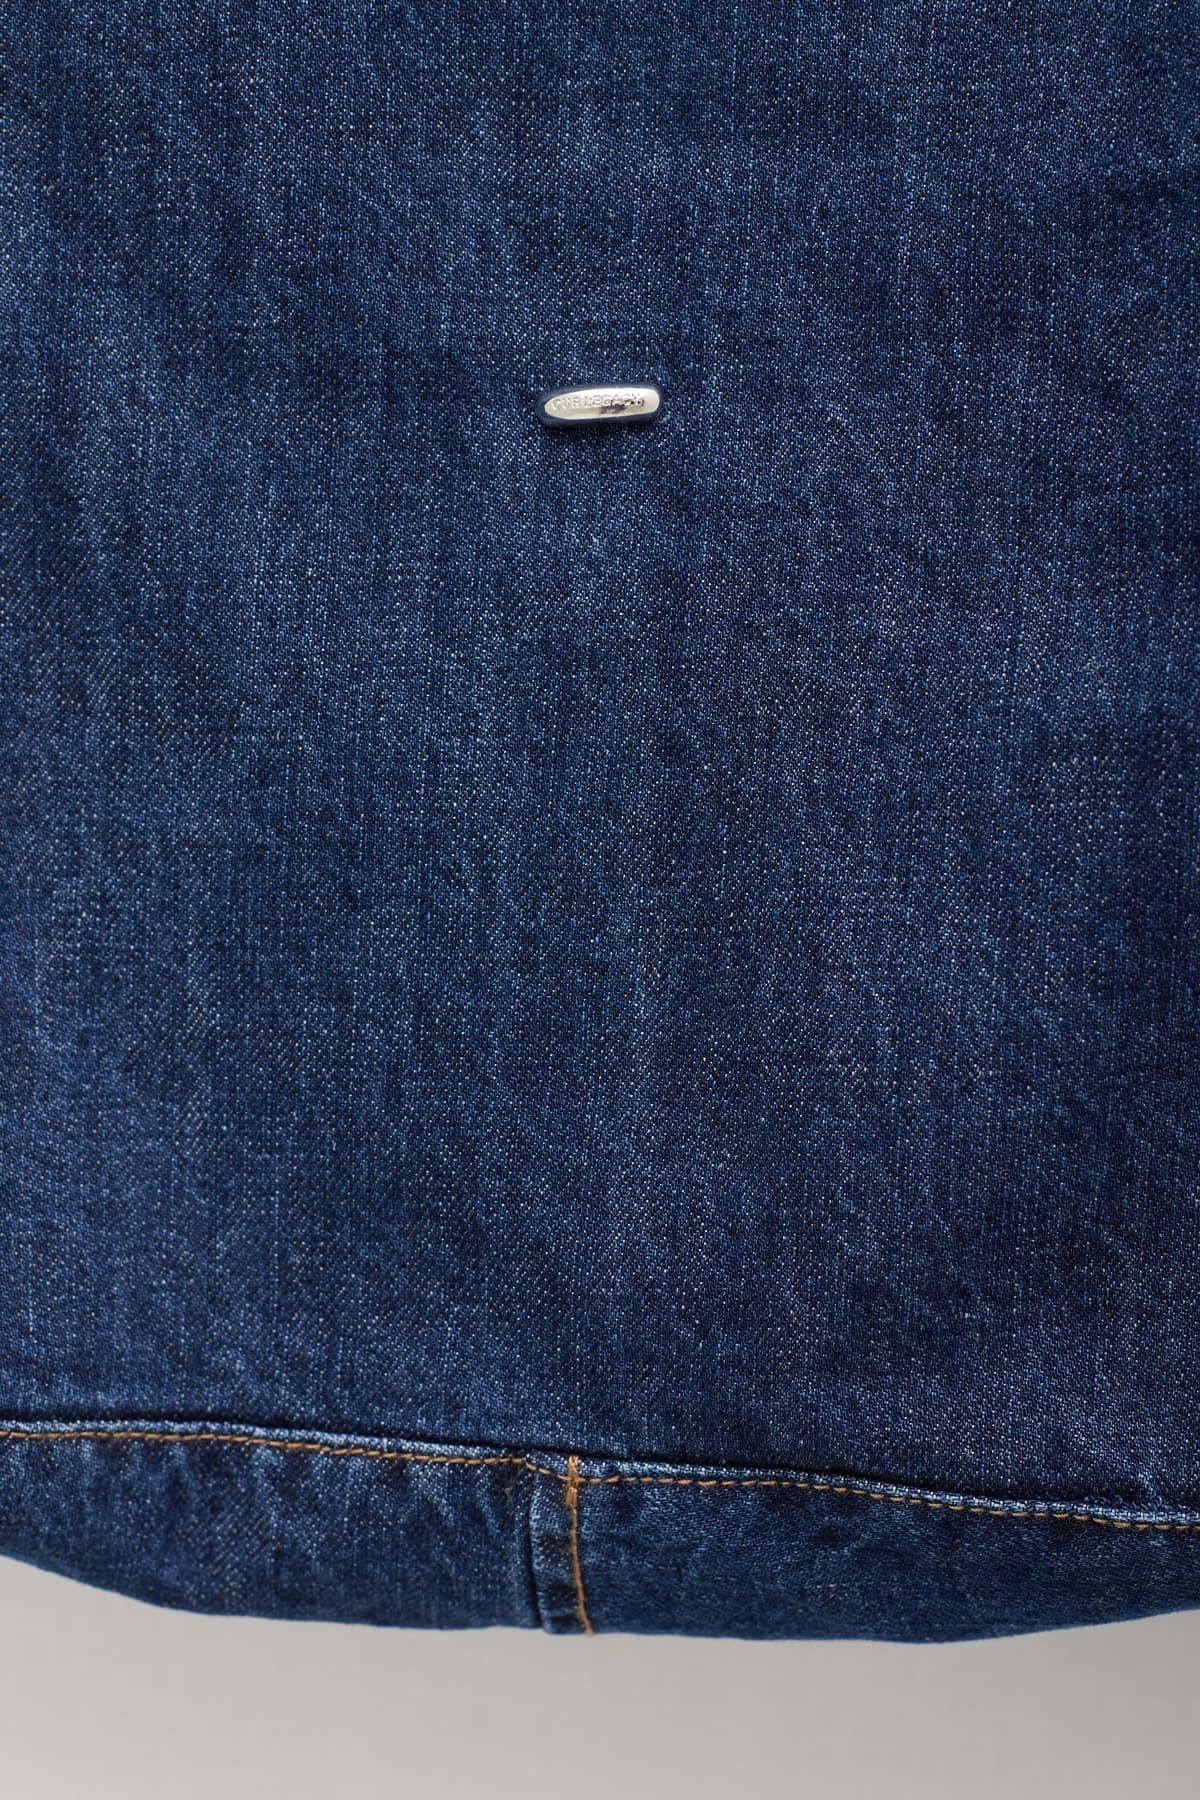 Shop Casablanca Diamong Monogram Pastel Silk Scarf